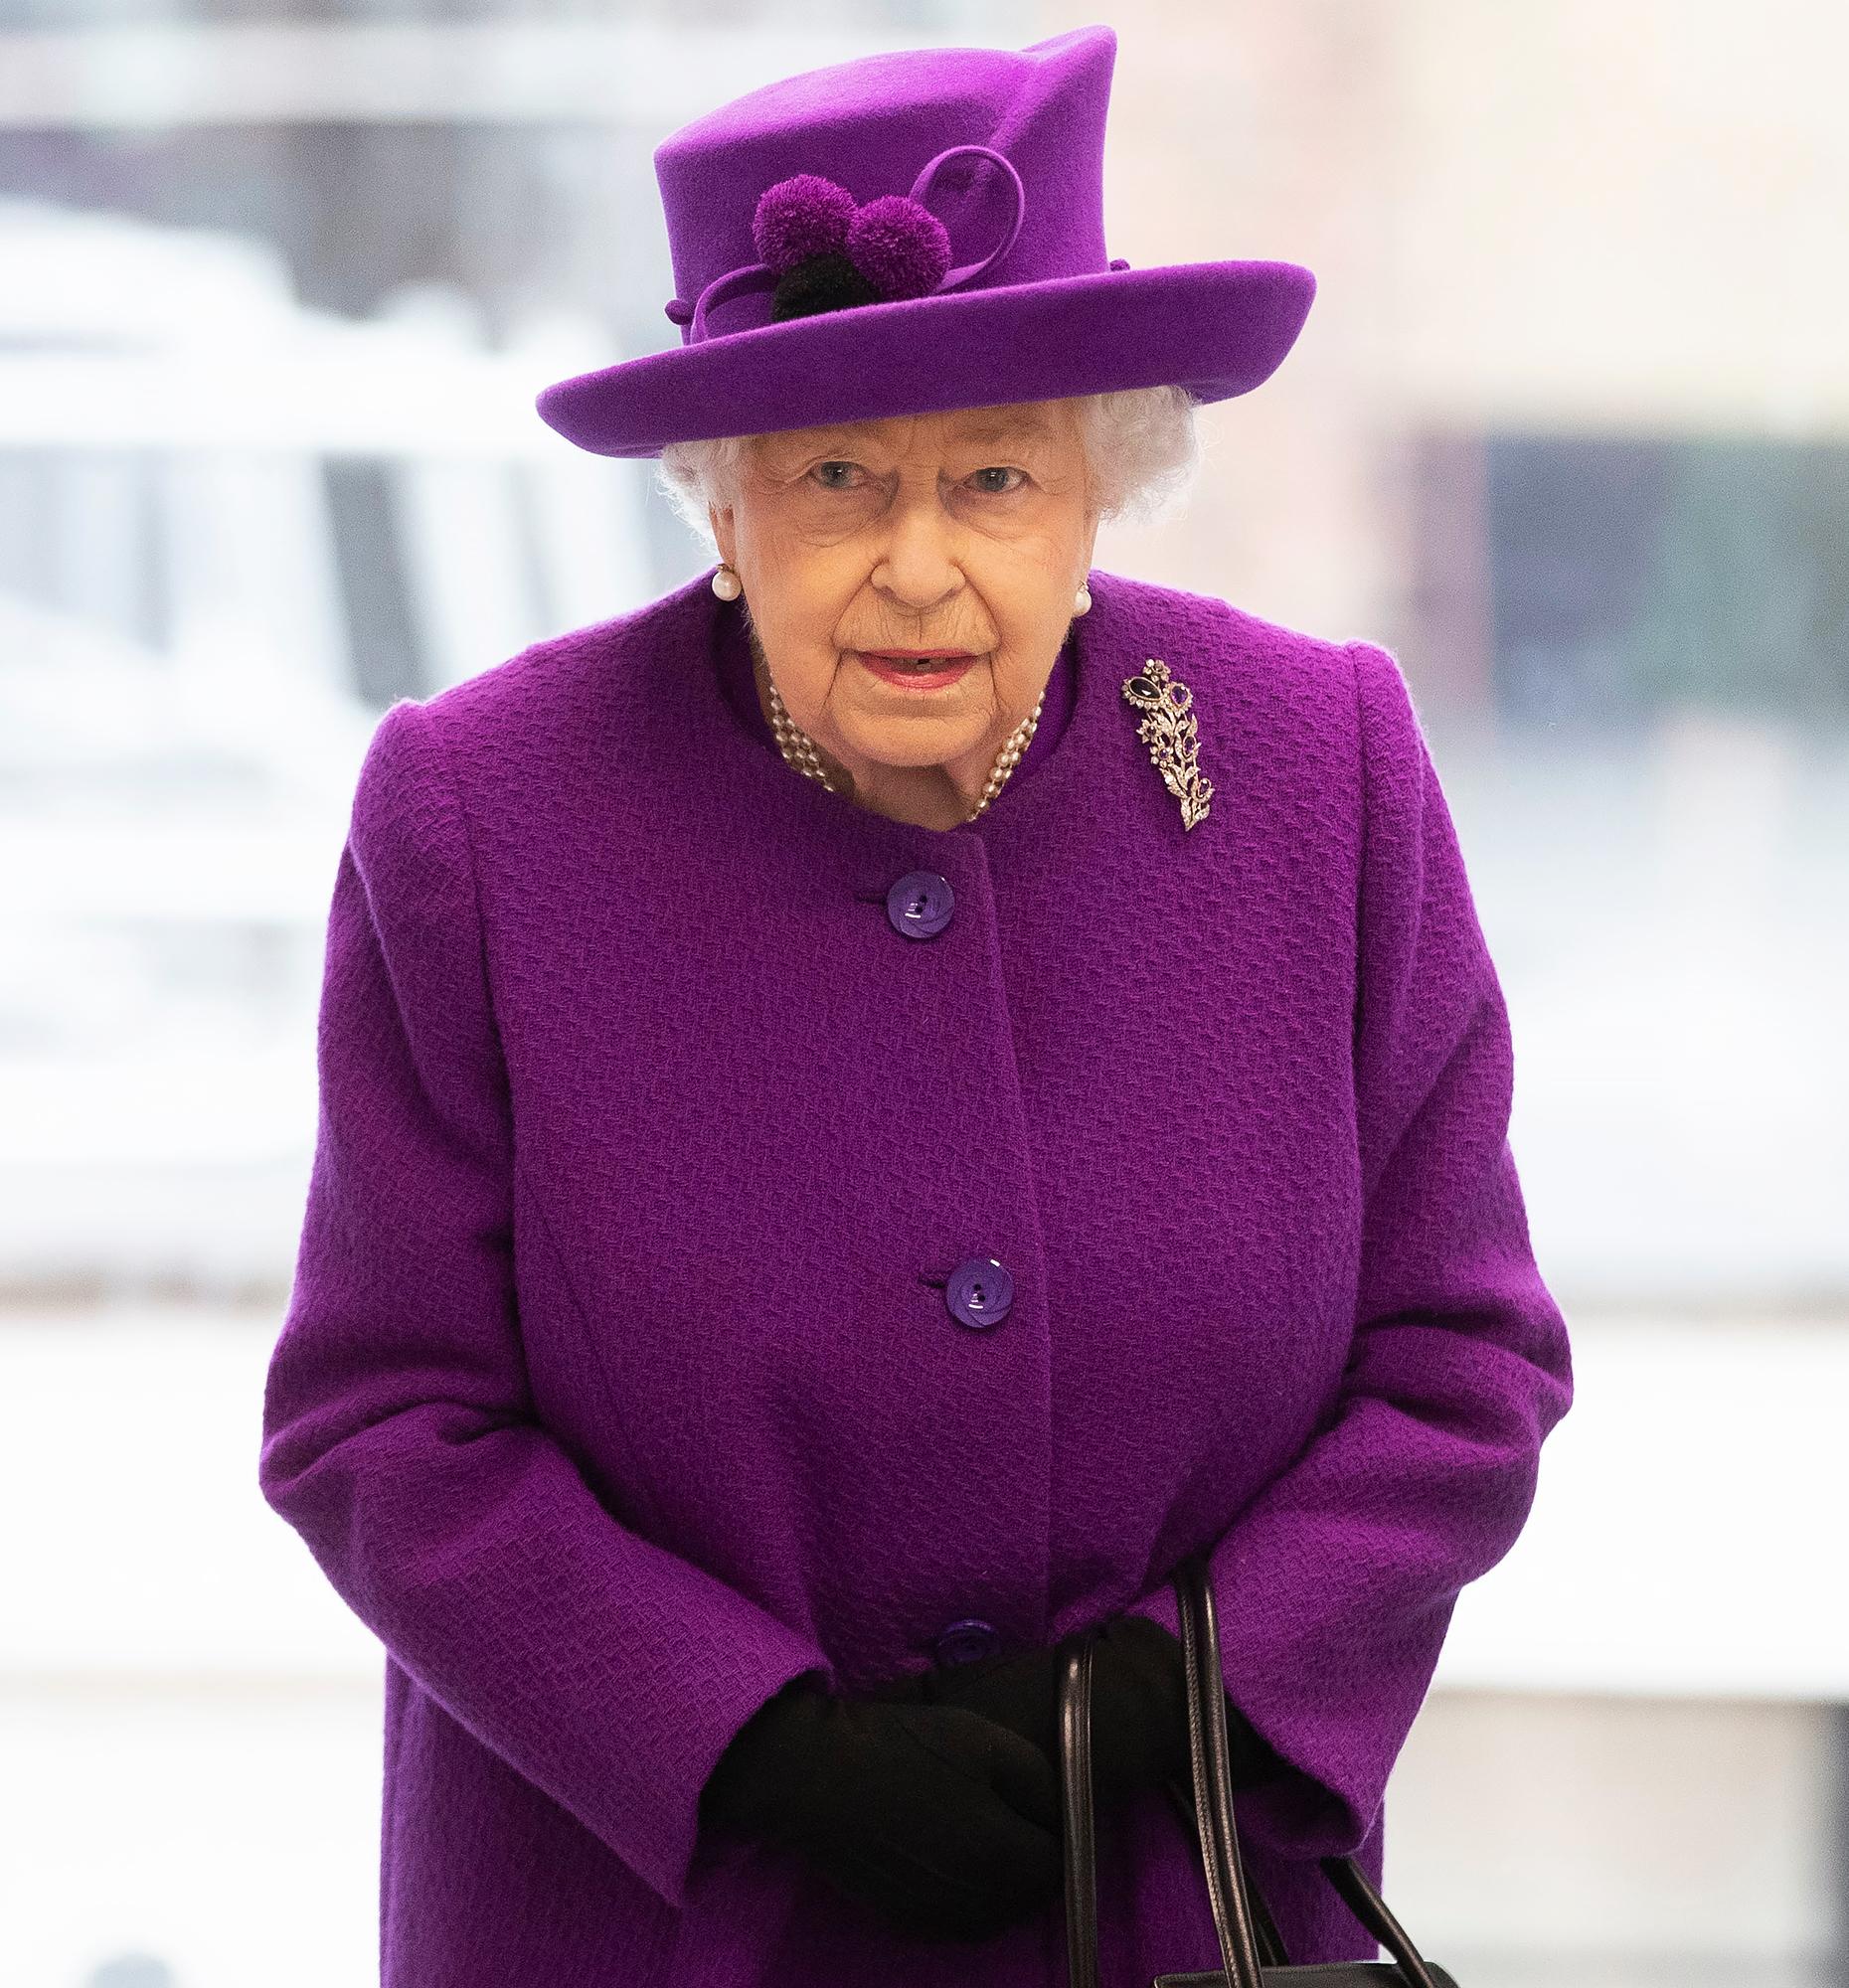 Prince Harry, Meghan Markle Called Queen Elizabeth II on Her Birthday 2